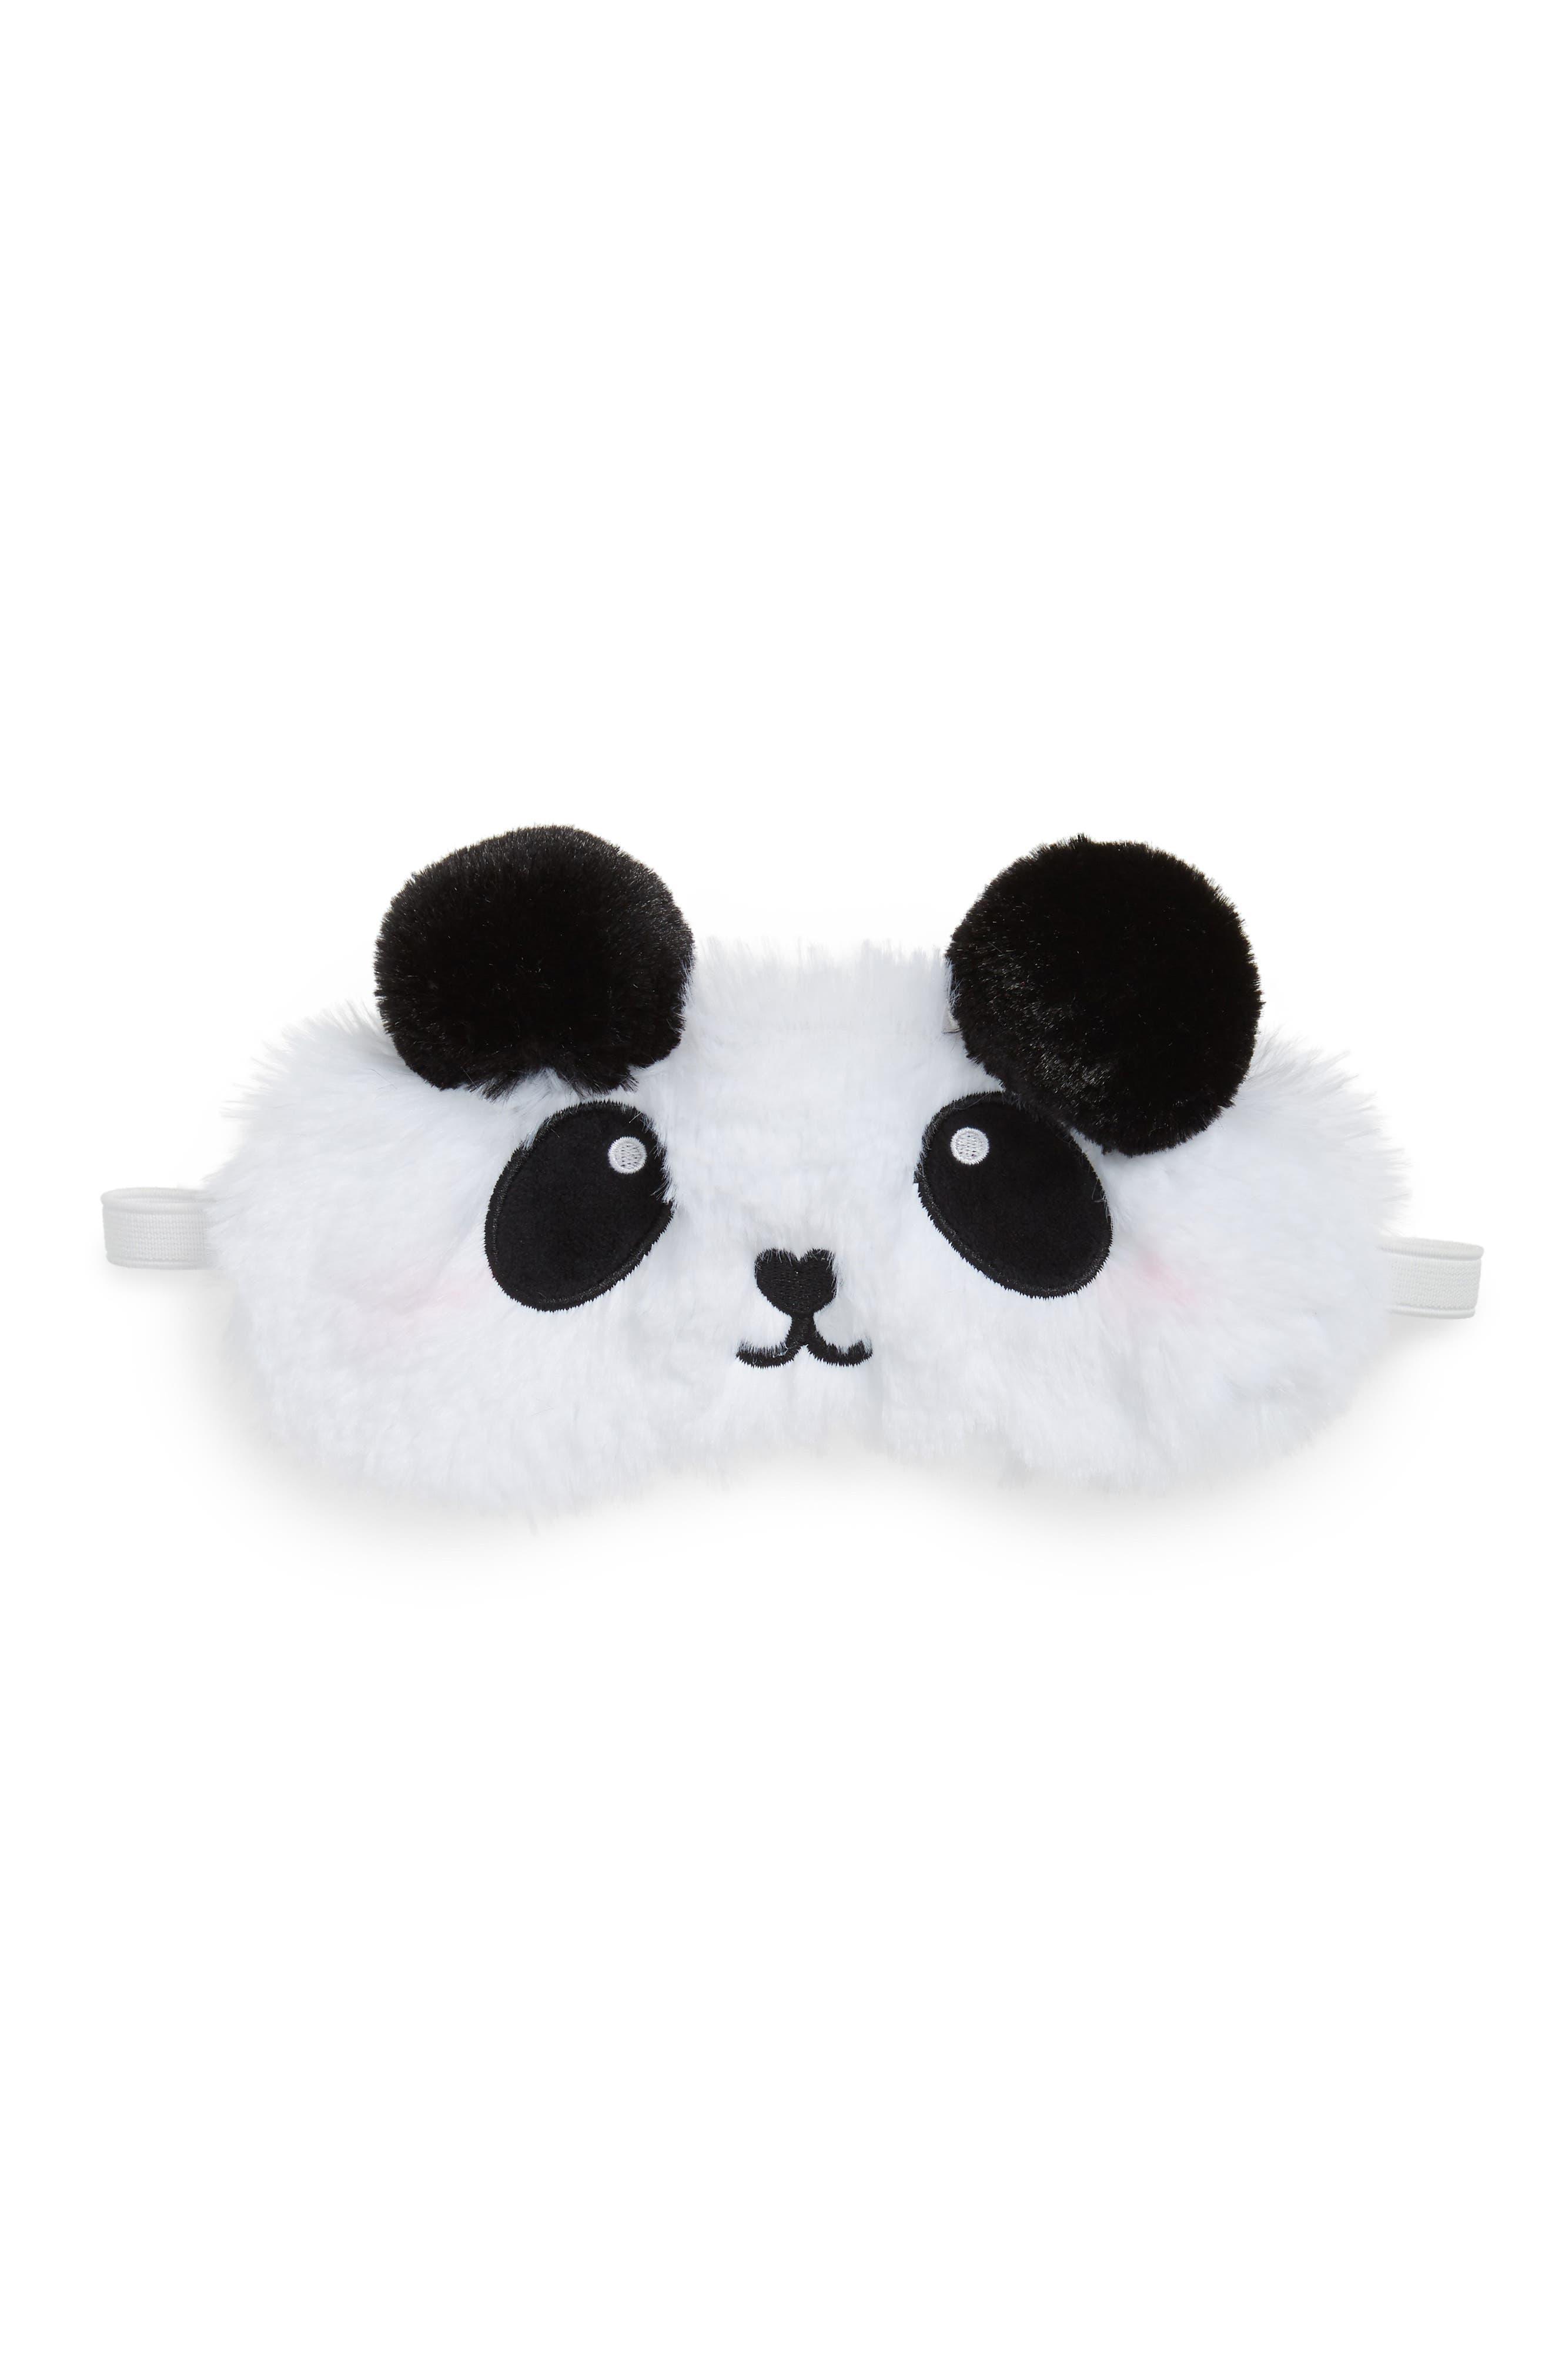 Panda Spa Eye Mask,                             Main thumbnail 1, color,                             White